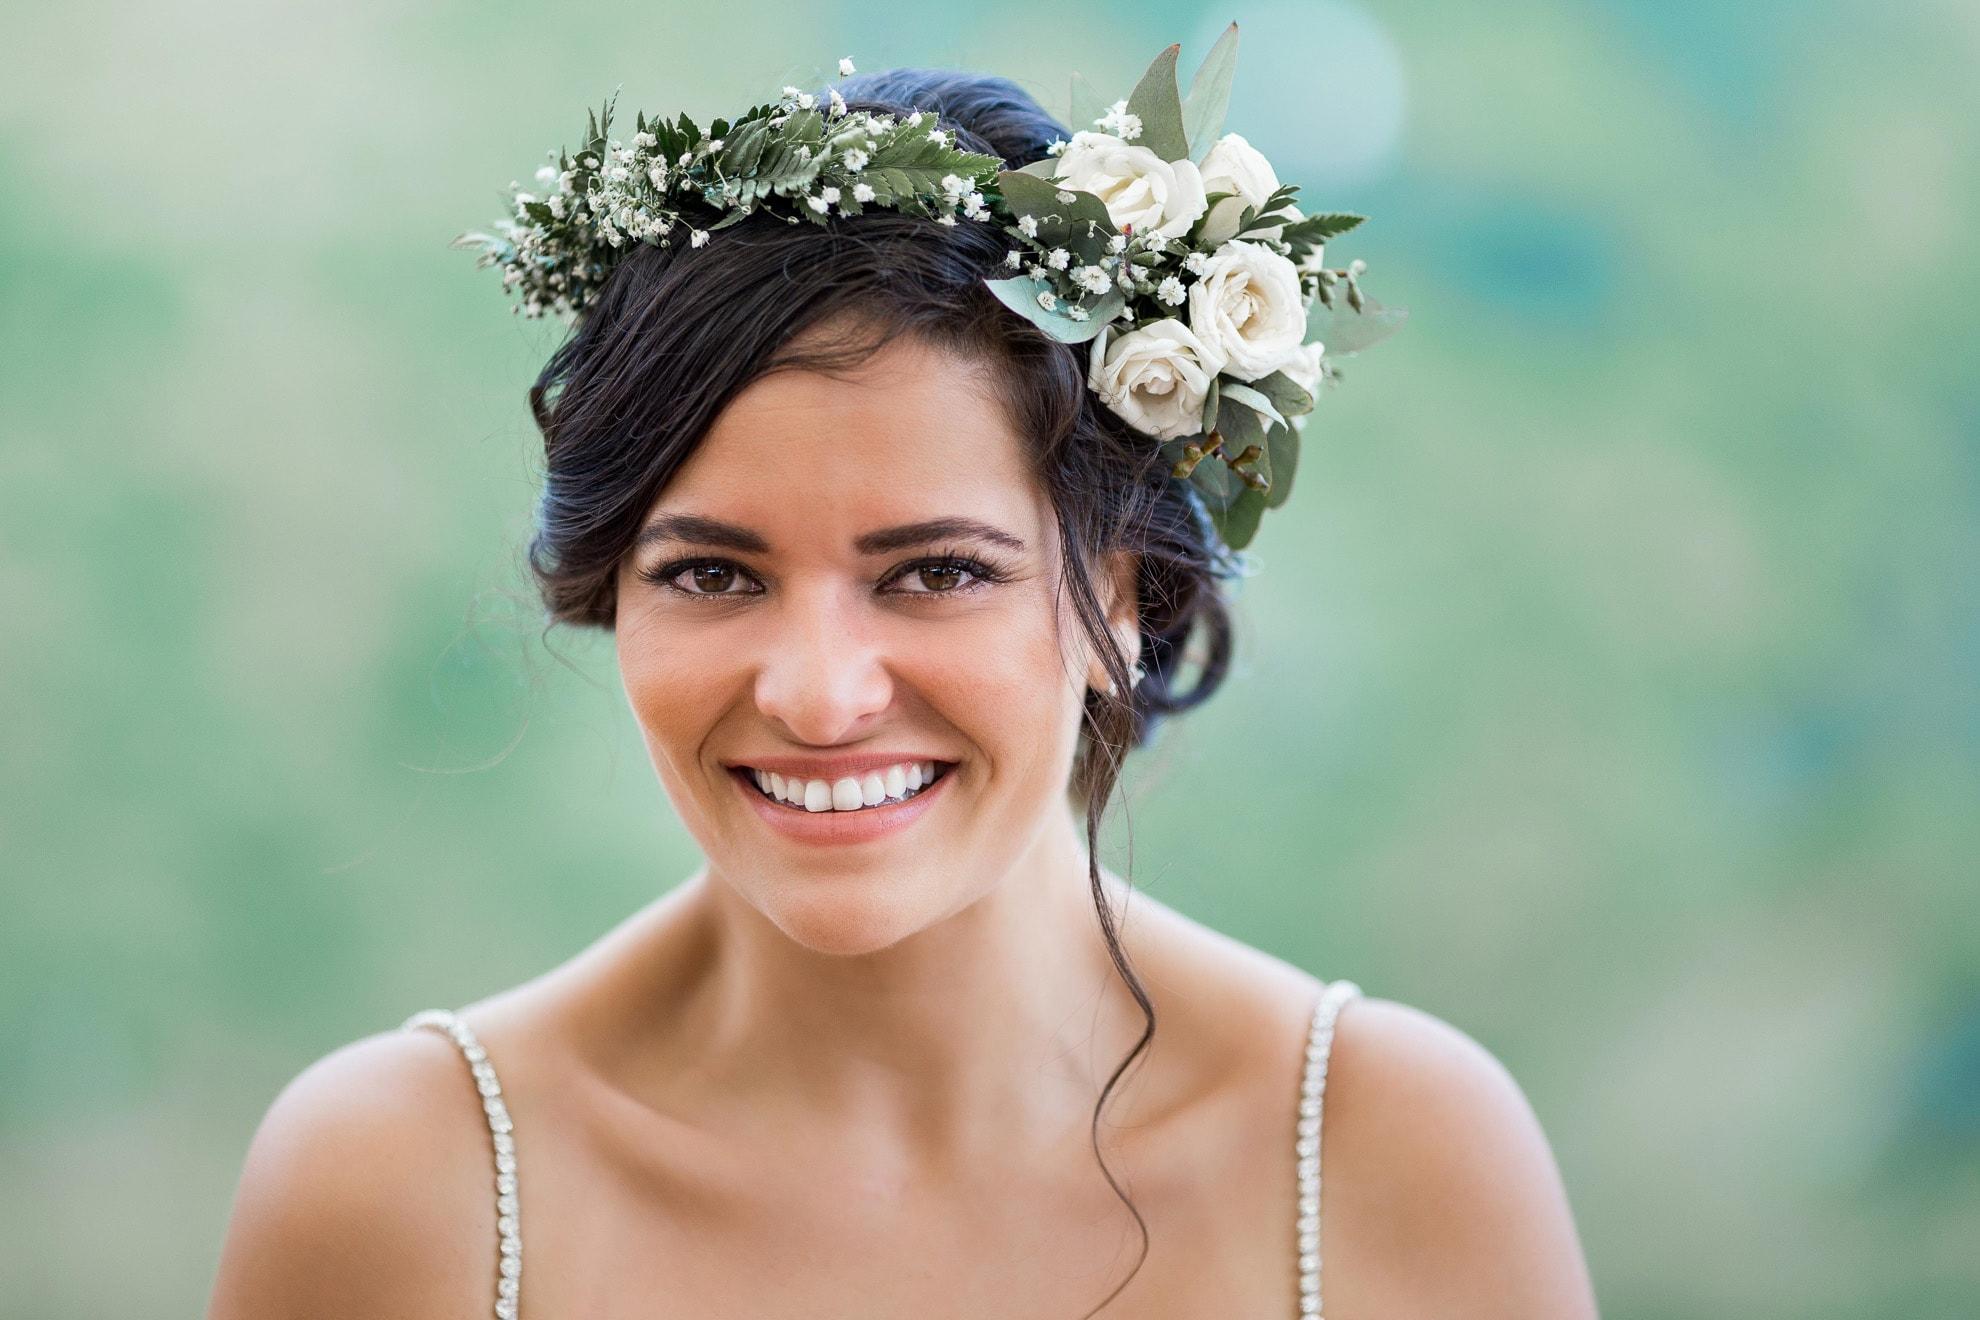 teary eyed bride La Mariposa Destination Wedding